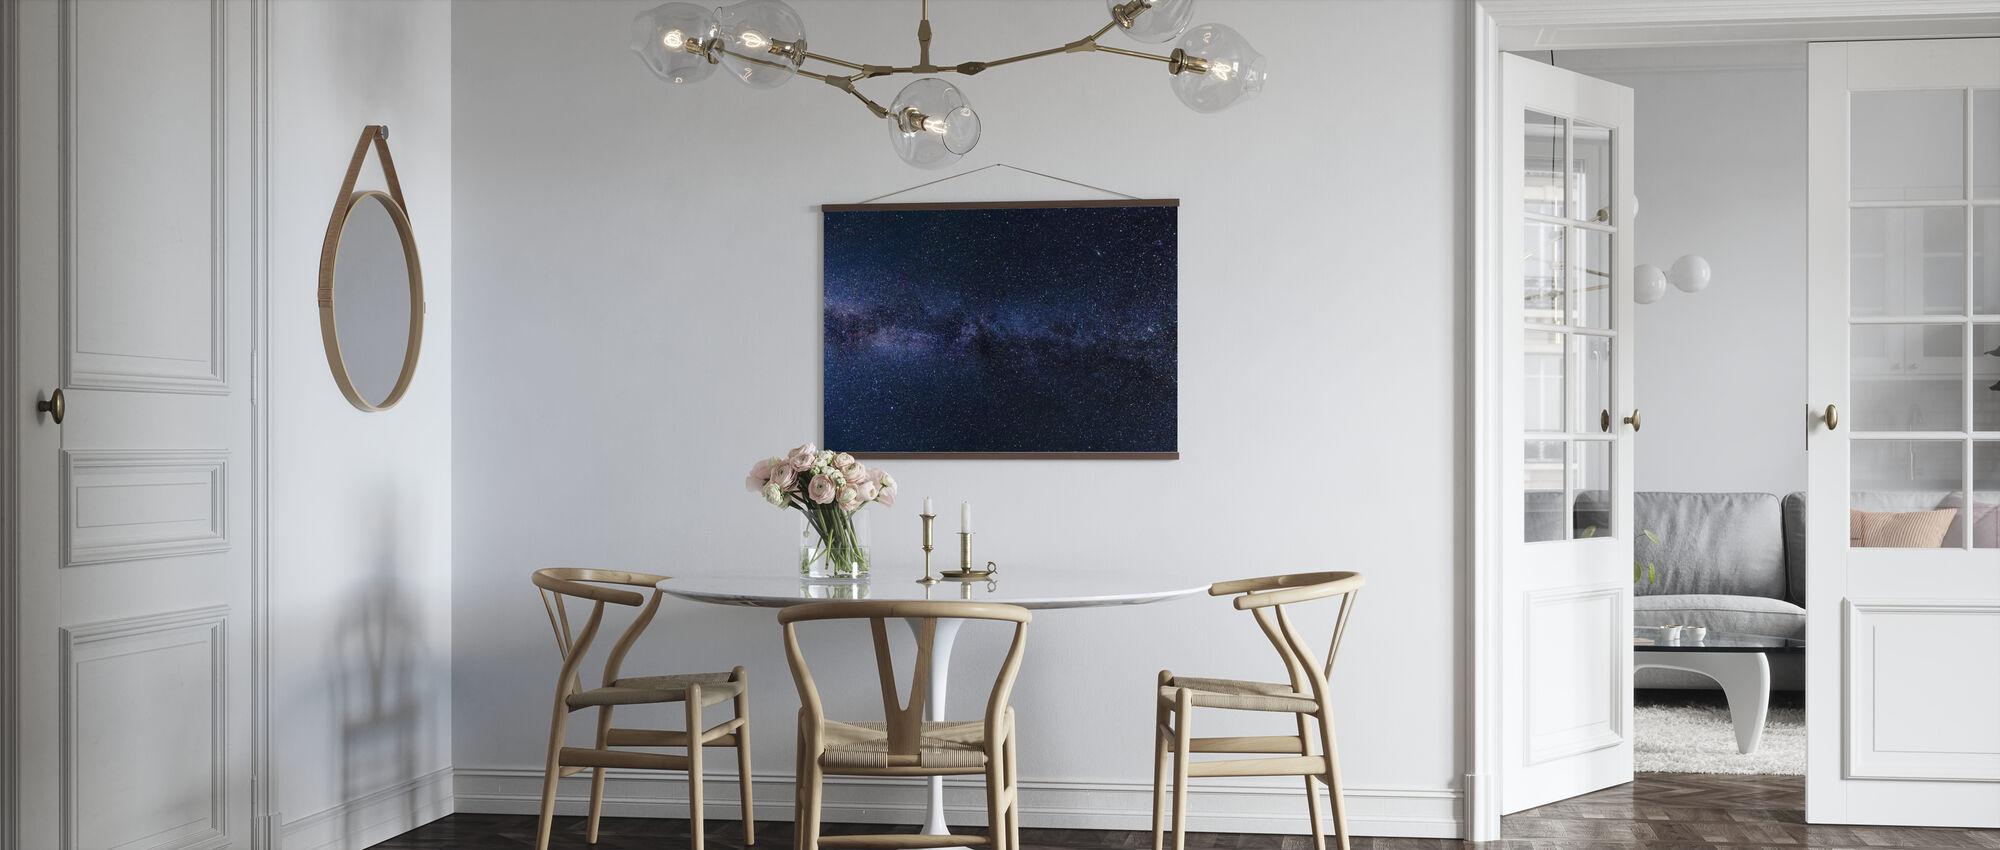 Mystical Starry Sky - Poster - Kitchen